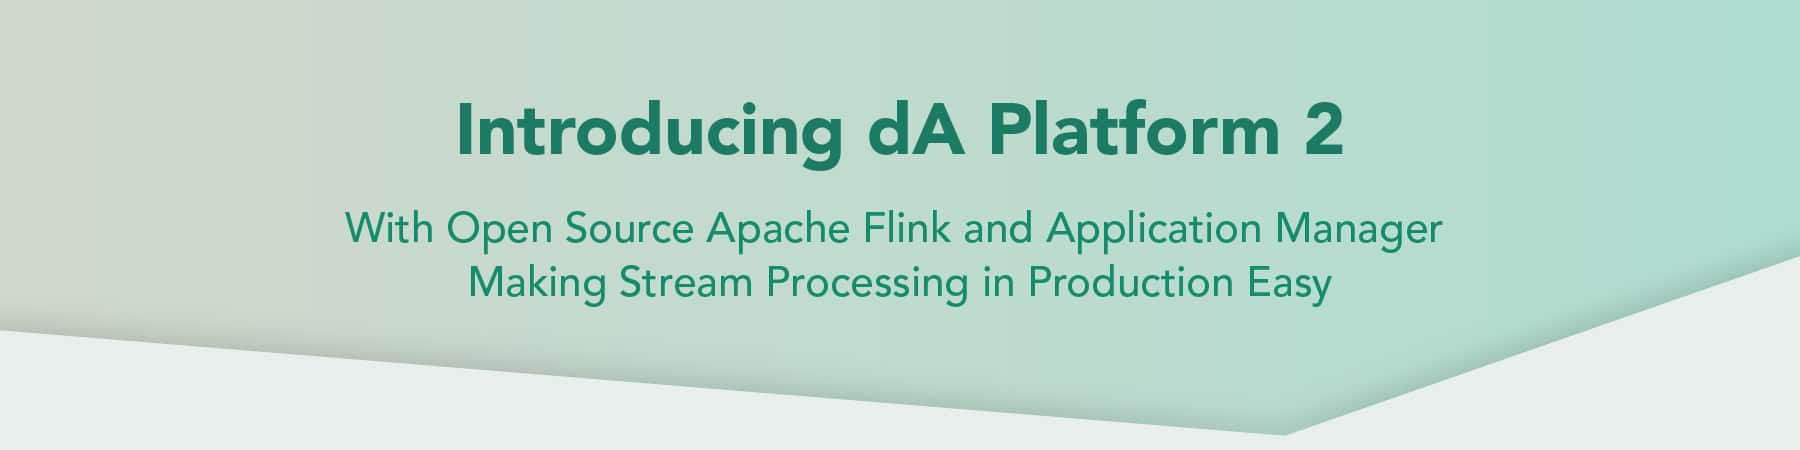 Announcing dA Platform 2 including Open Source Apache Flink and Application Manager